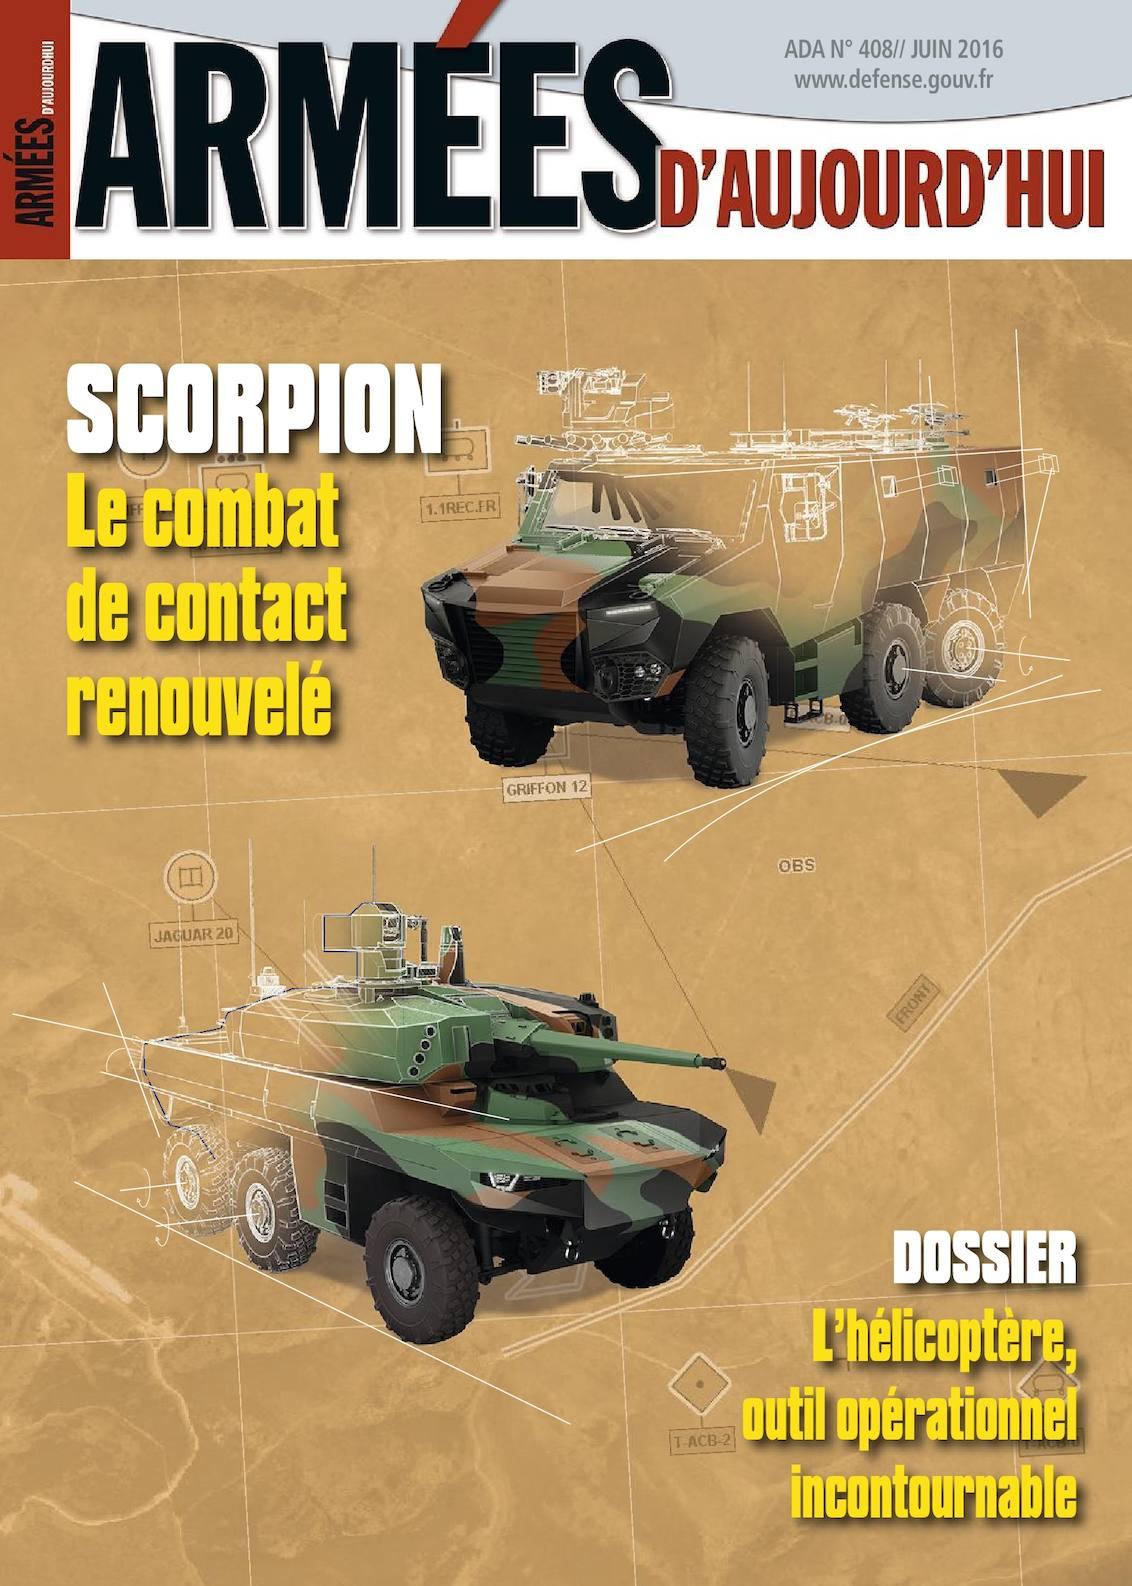 Armées d'Aujourd'hui n° 408 Juin 2016